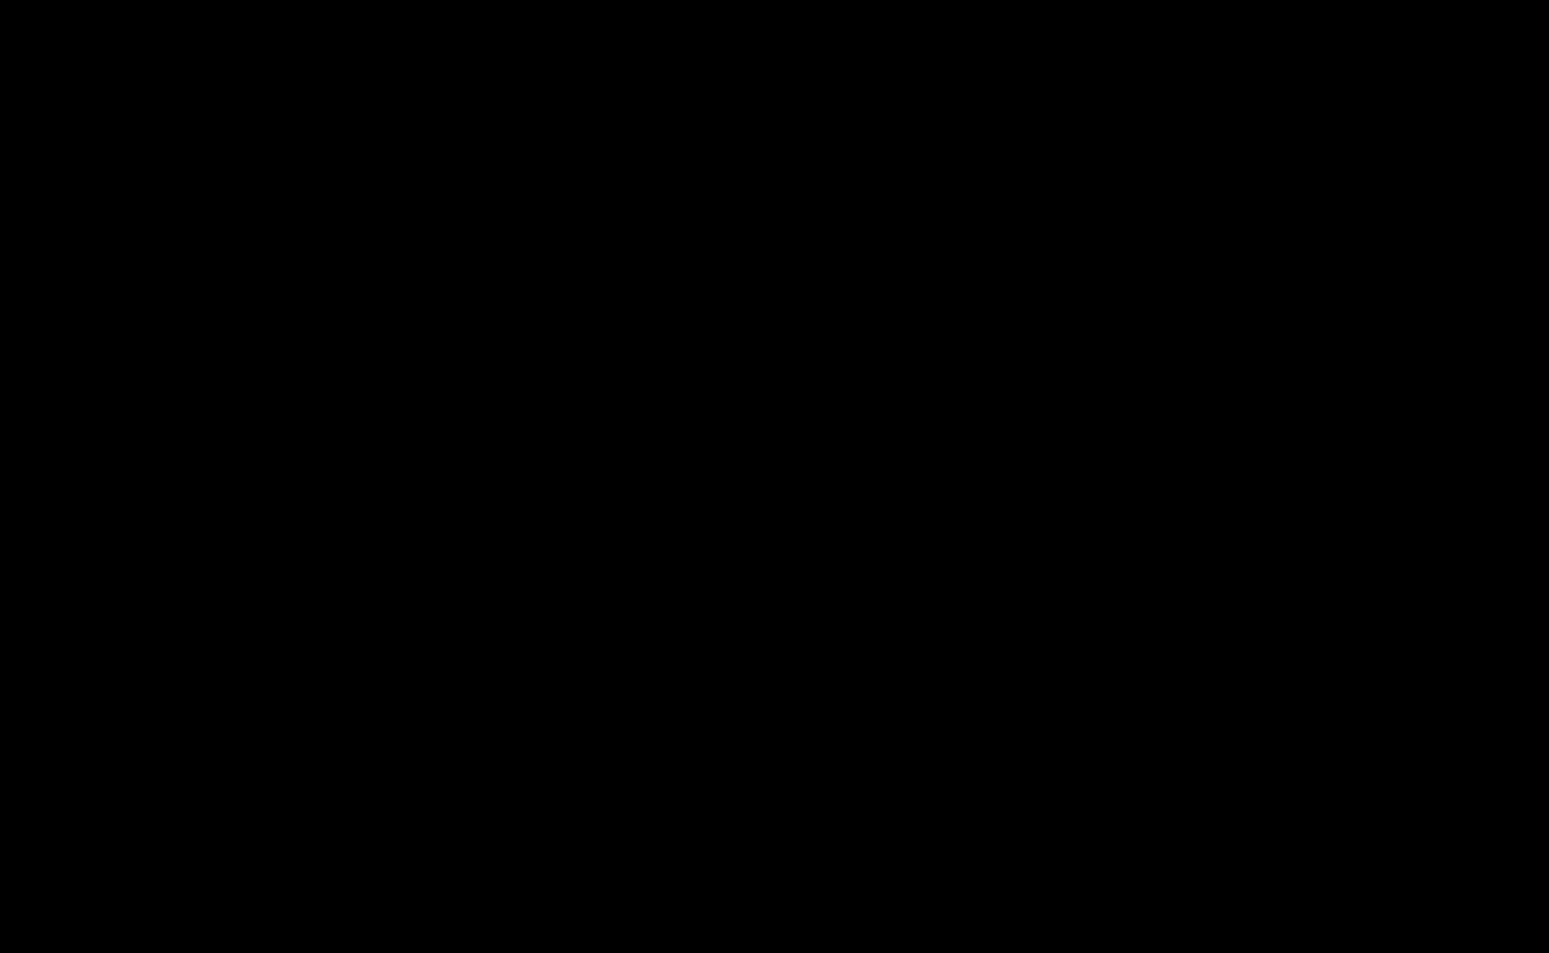 NHS-dPEG®₄-biotinidase resistant biotin